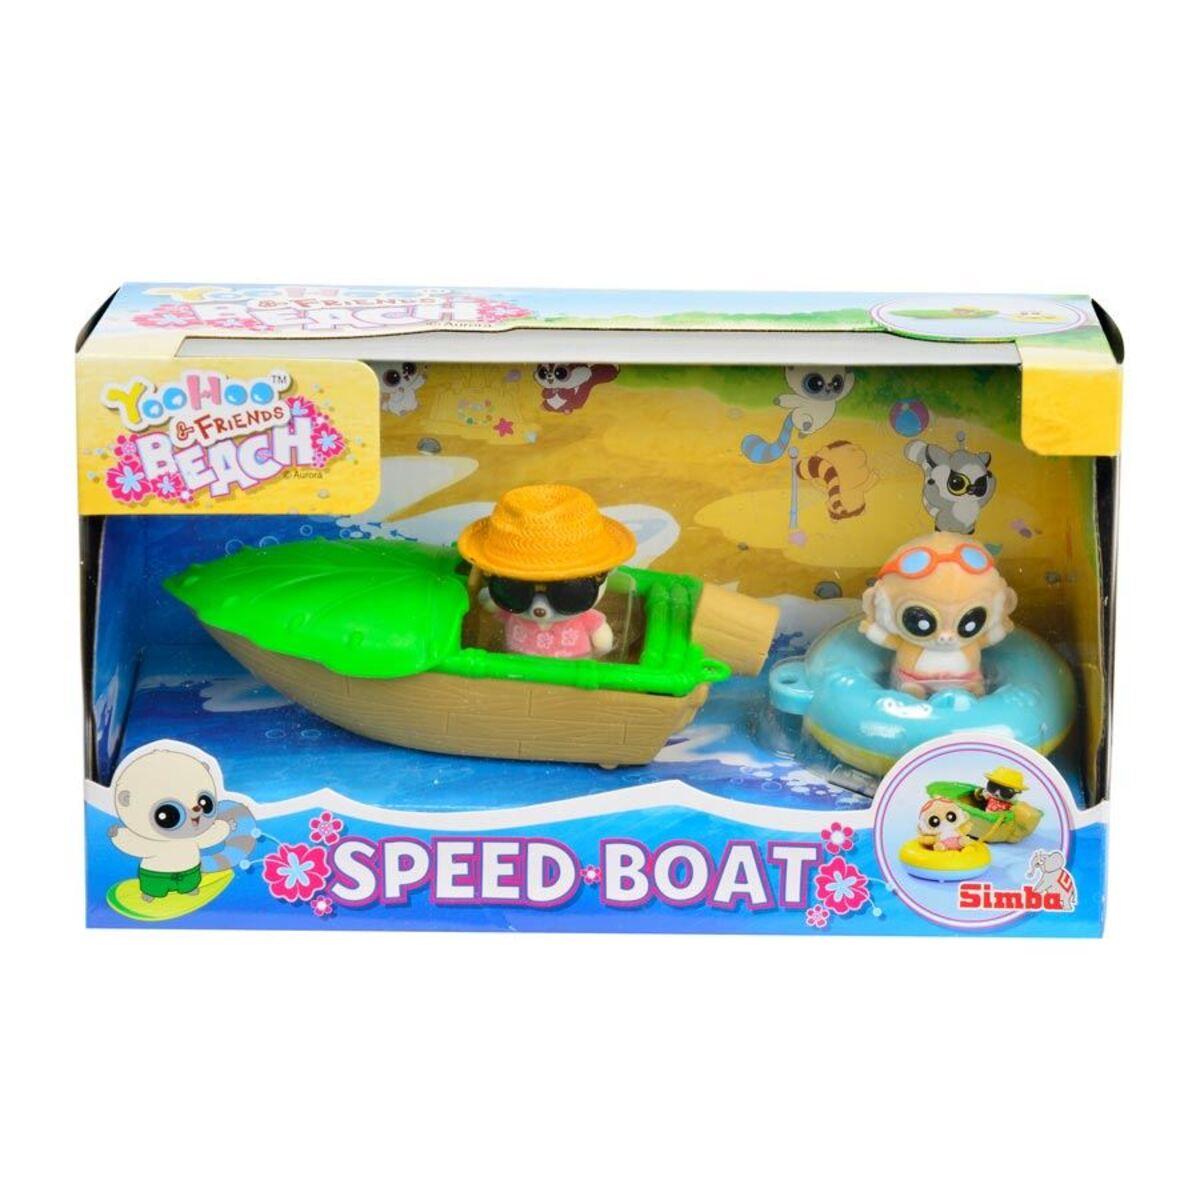 Bild 2 von Simba YooHoo & Friends Speed Boat